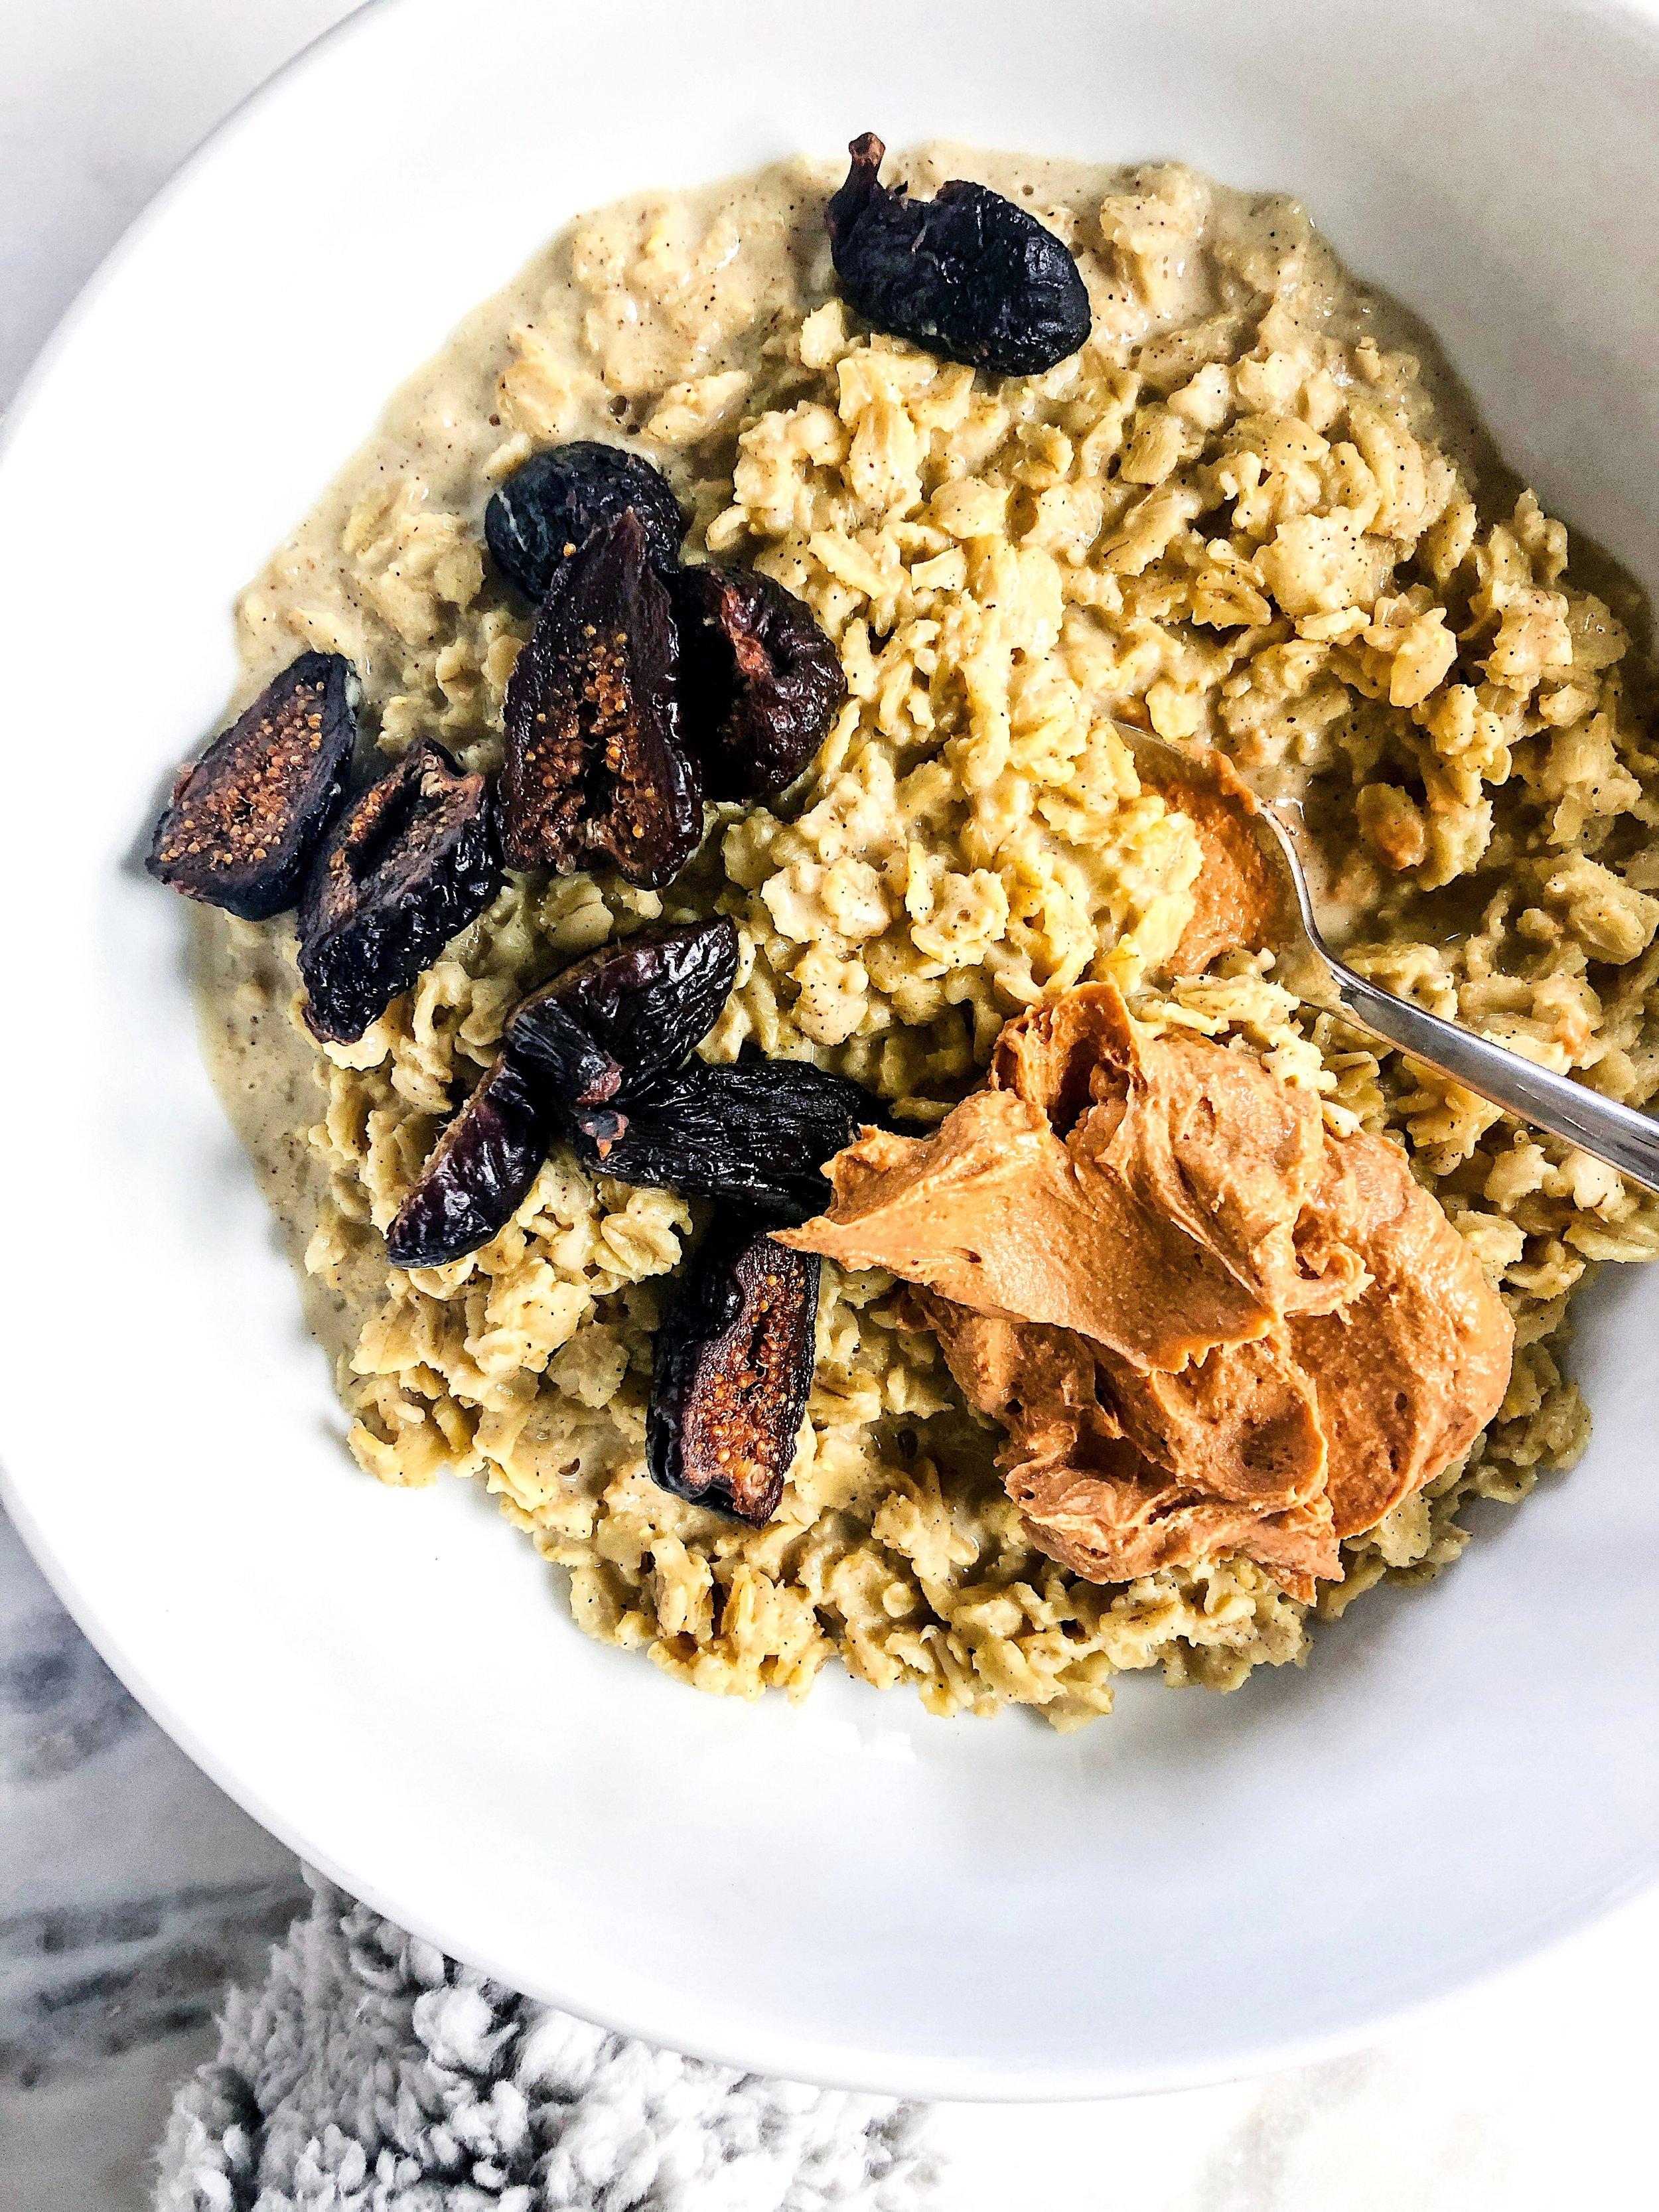 turmeric cinnamon oats2.jpg